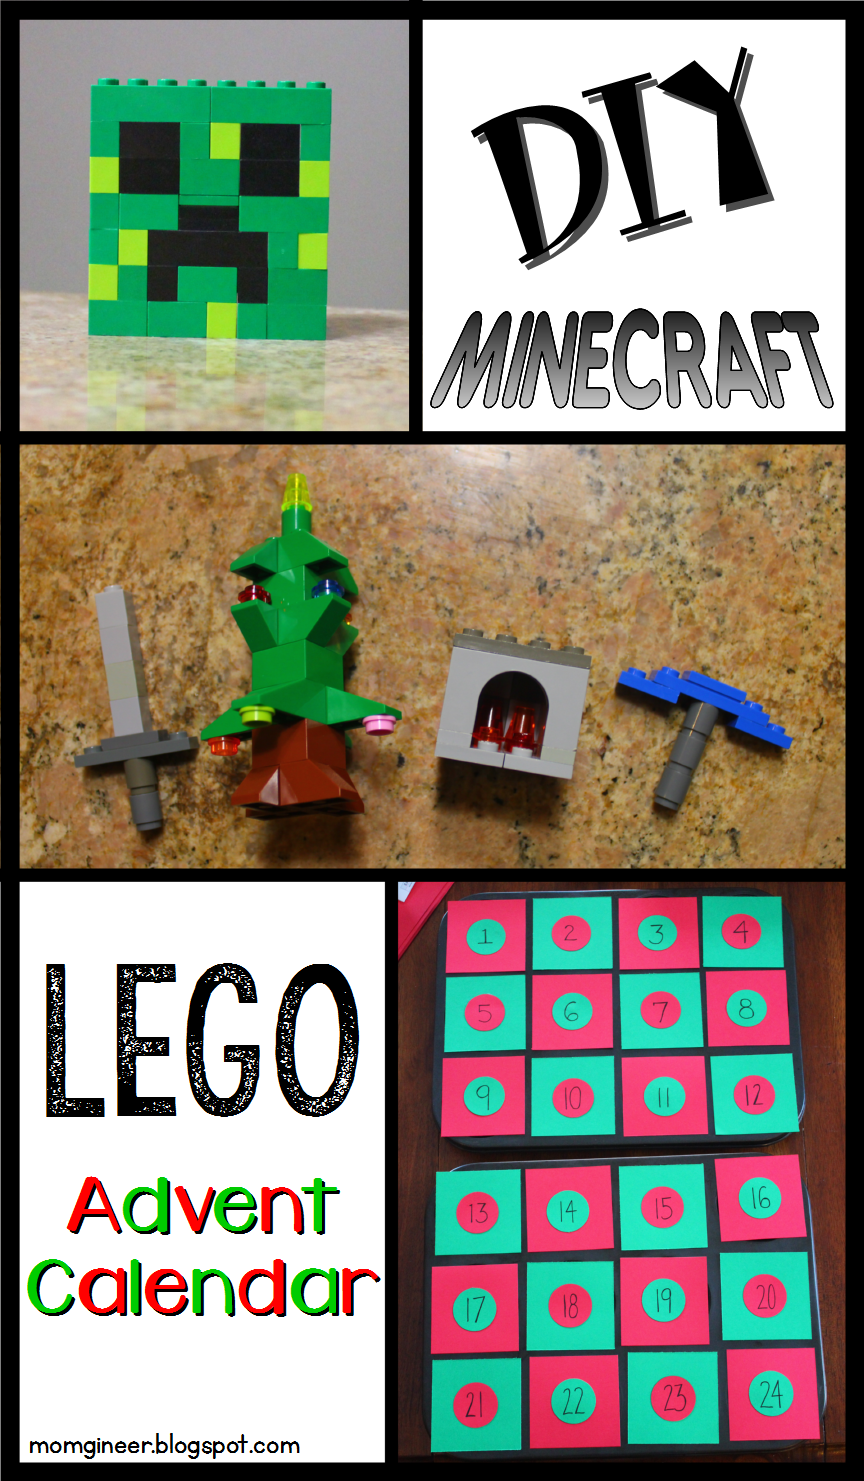 Christmas Calendar Minecraft Download : Minecraft lego advent calendar